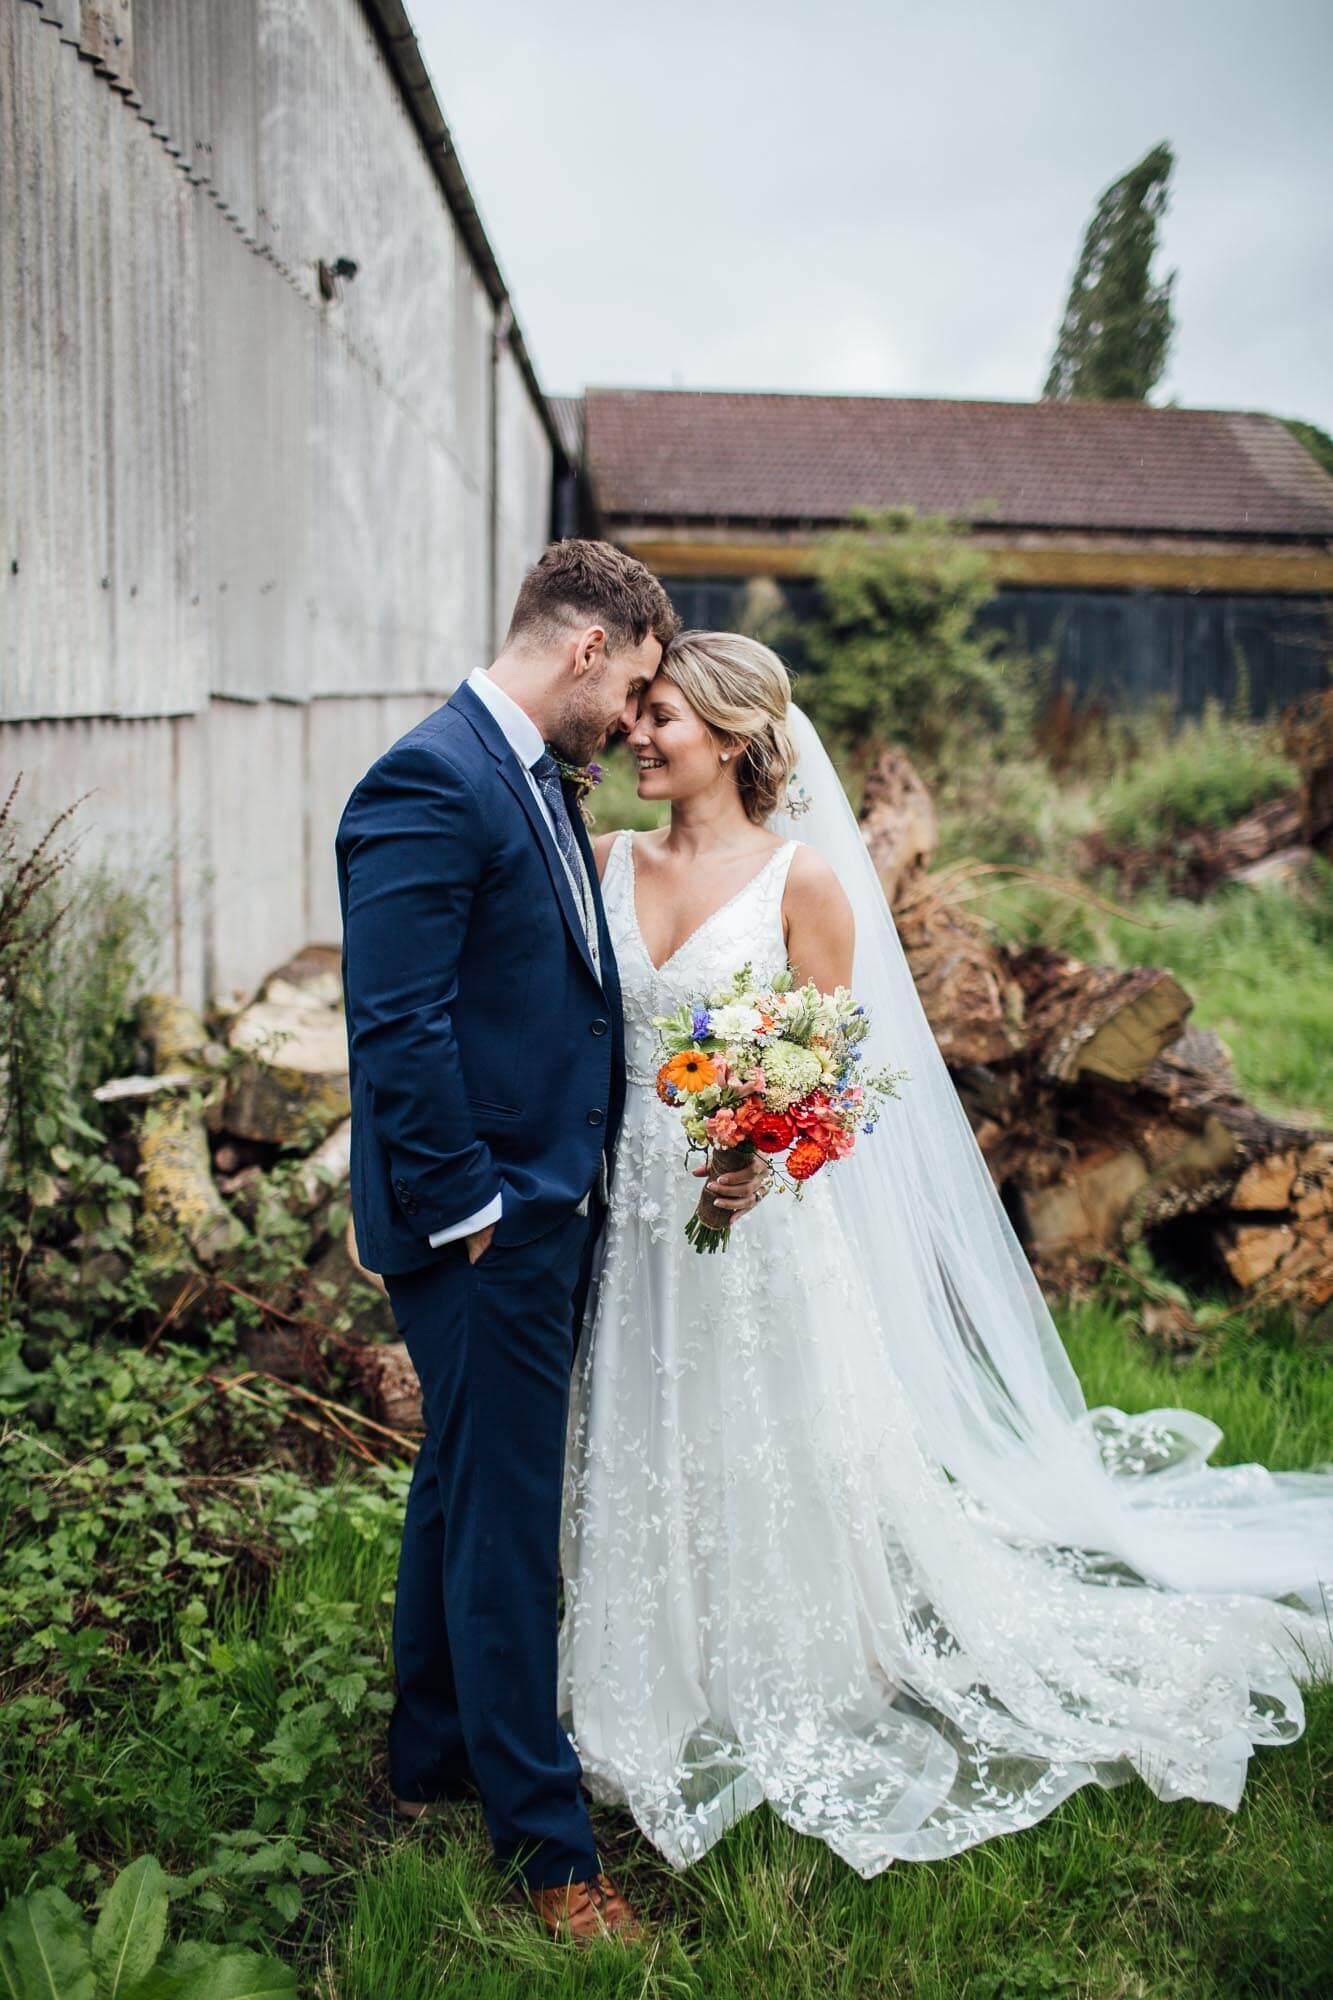 Beth & Morgan 21 | Bristol Wedding Photographer